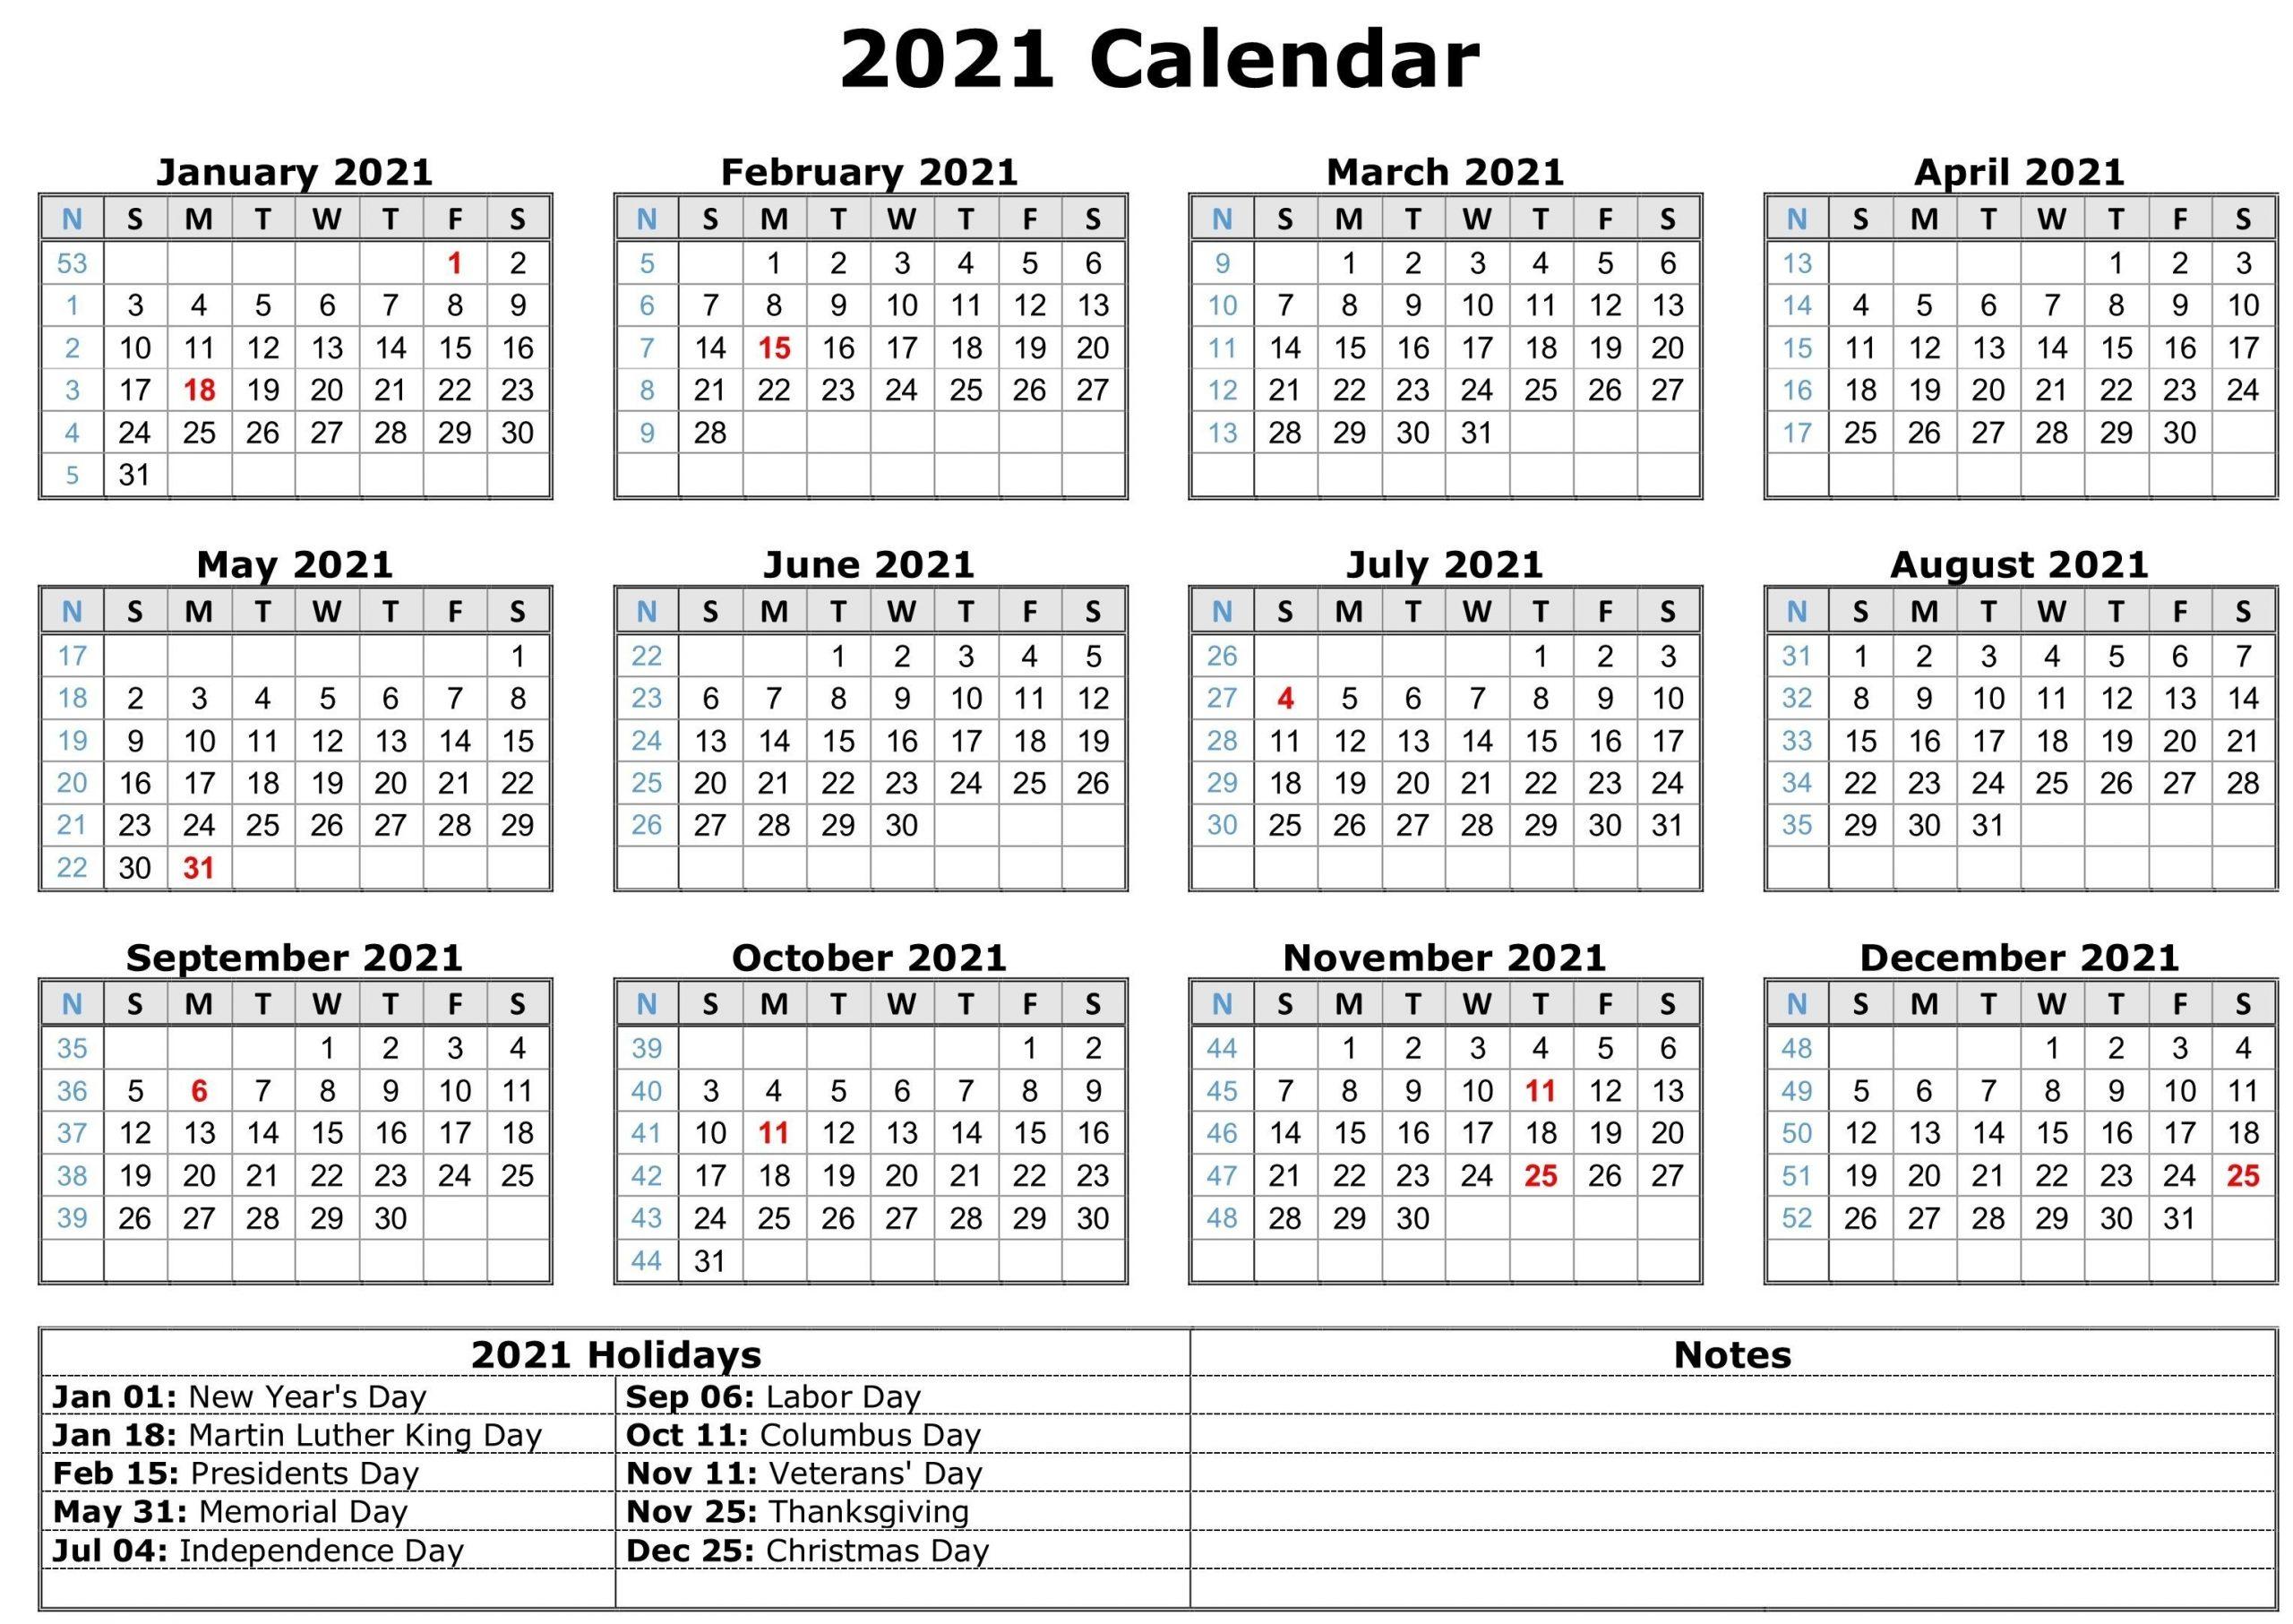 2021 Calendar With Holidays | Calendar Template, Free